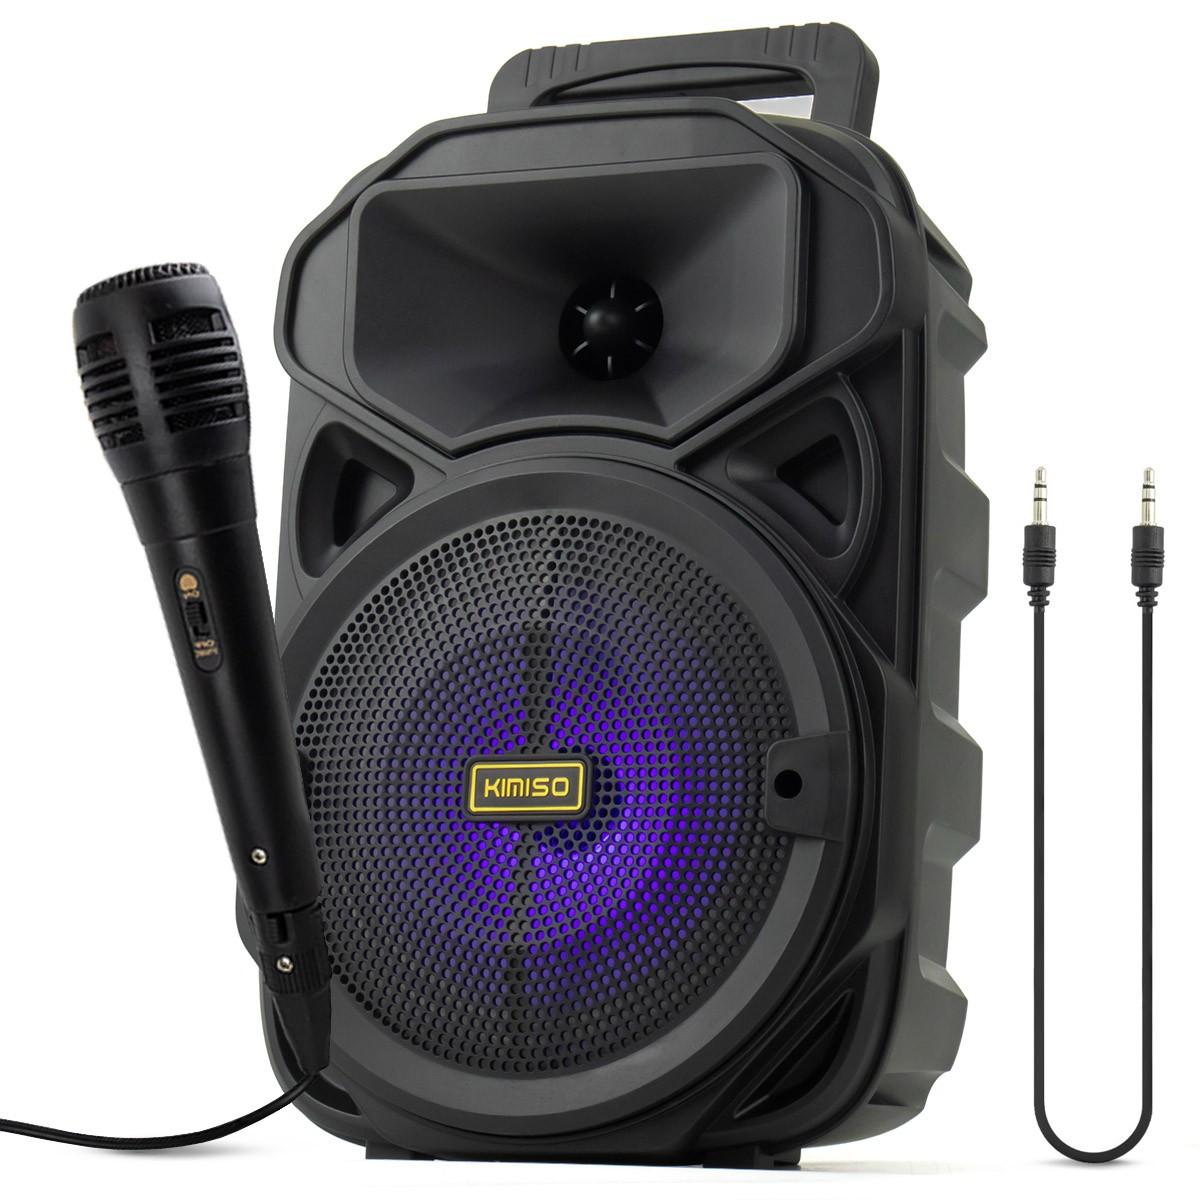 Caixa de Som Bluetooth Portátil 1200 Watts PMPO com Microfone + Cabo Auxiliar P2 Kimiso KMS-3382